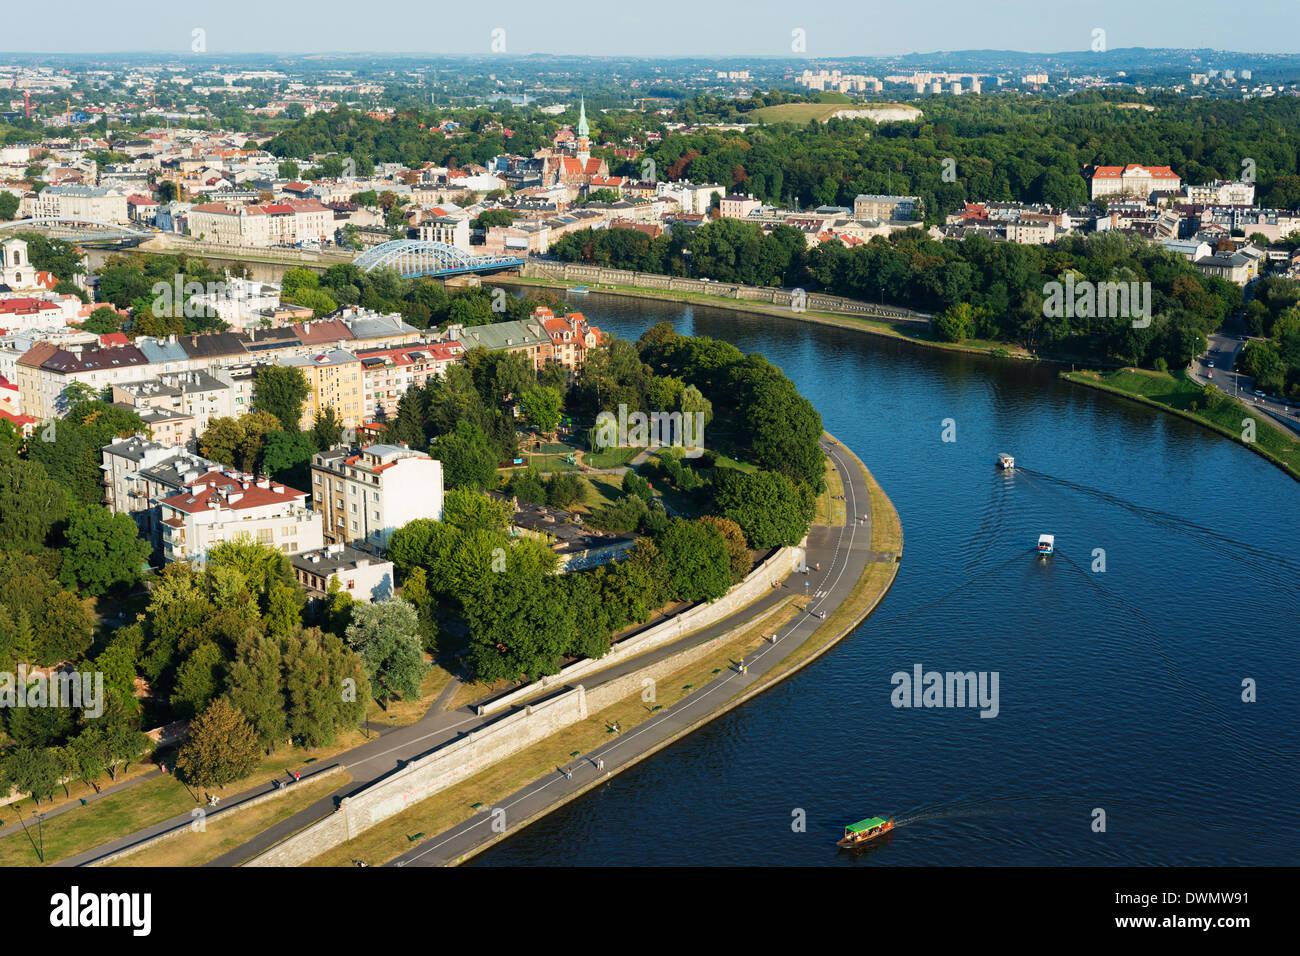 Fiume Vistola, Cracovia, Malopolska, Polonia, Europa Immagini Stock